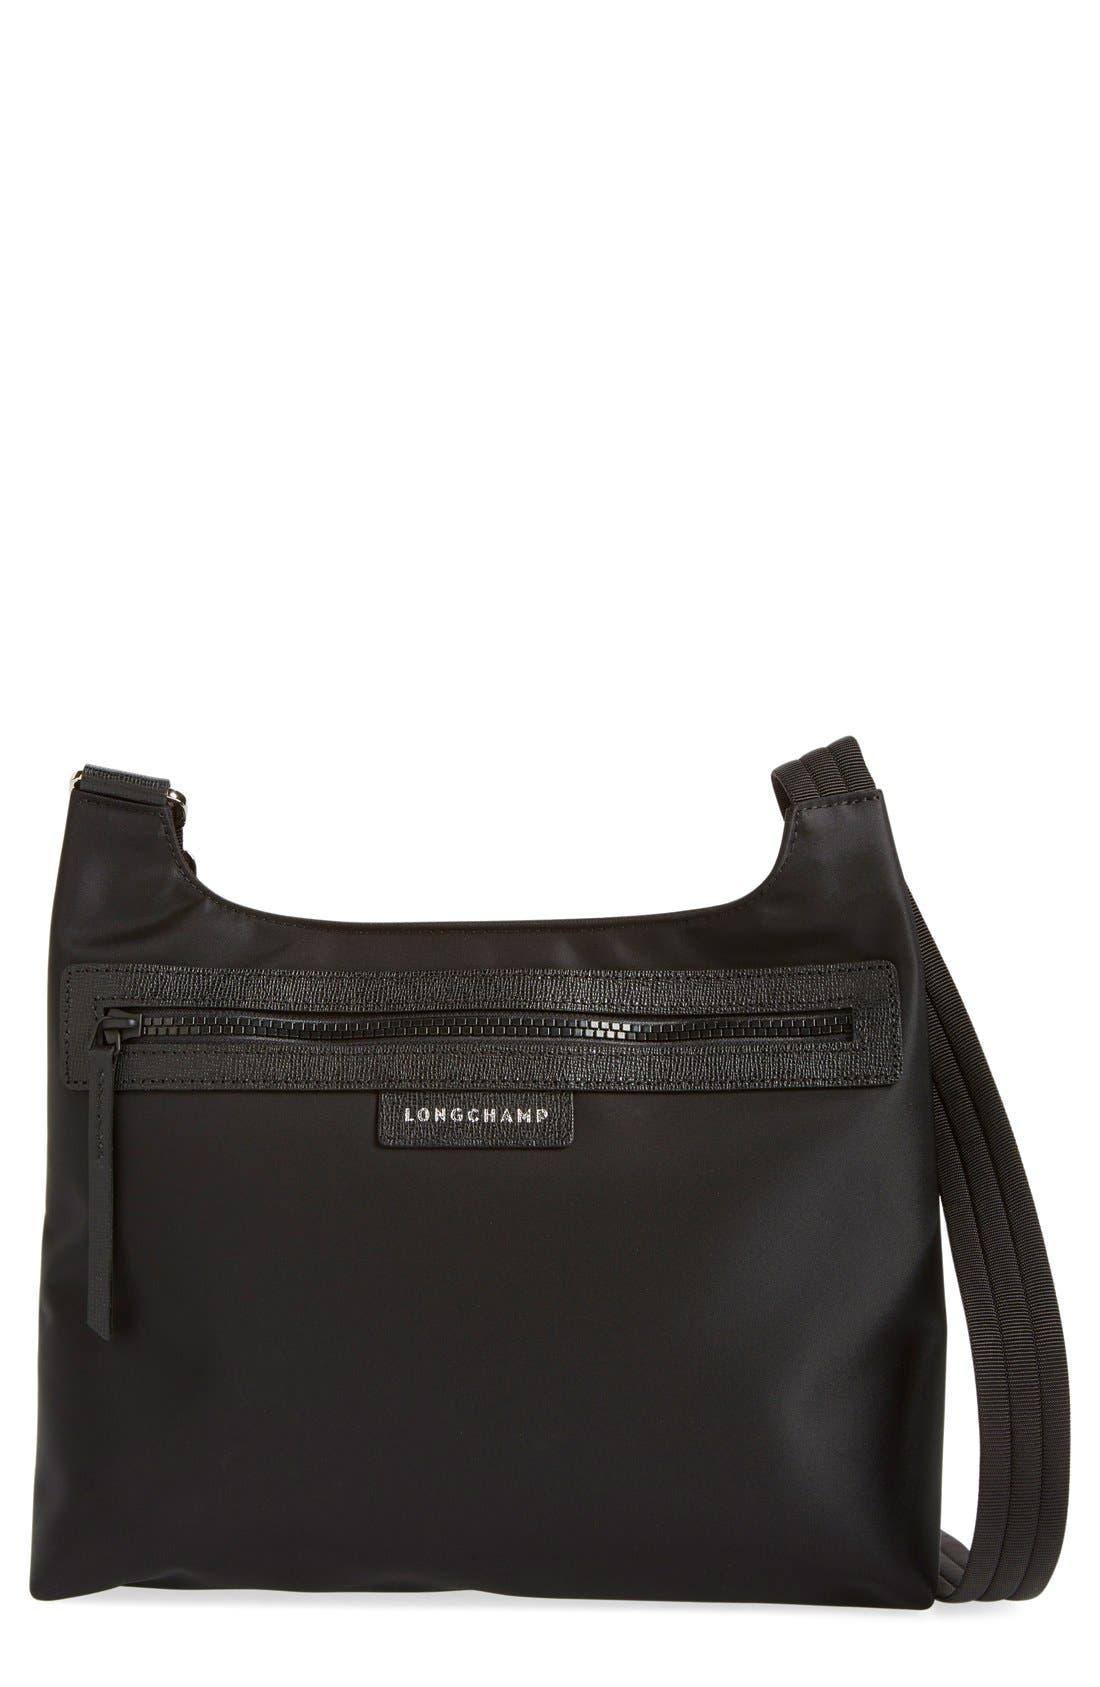 Main Image - Longchamp 'Le Pliage Neo' Nylon Crossbody Bag